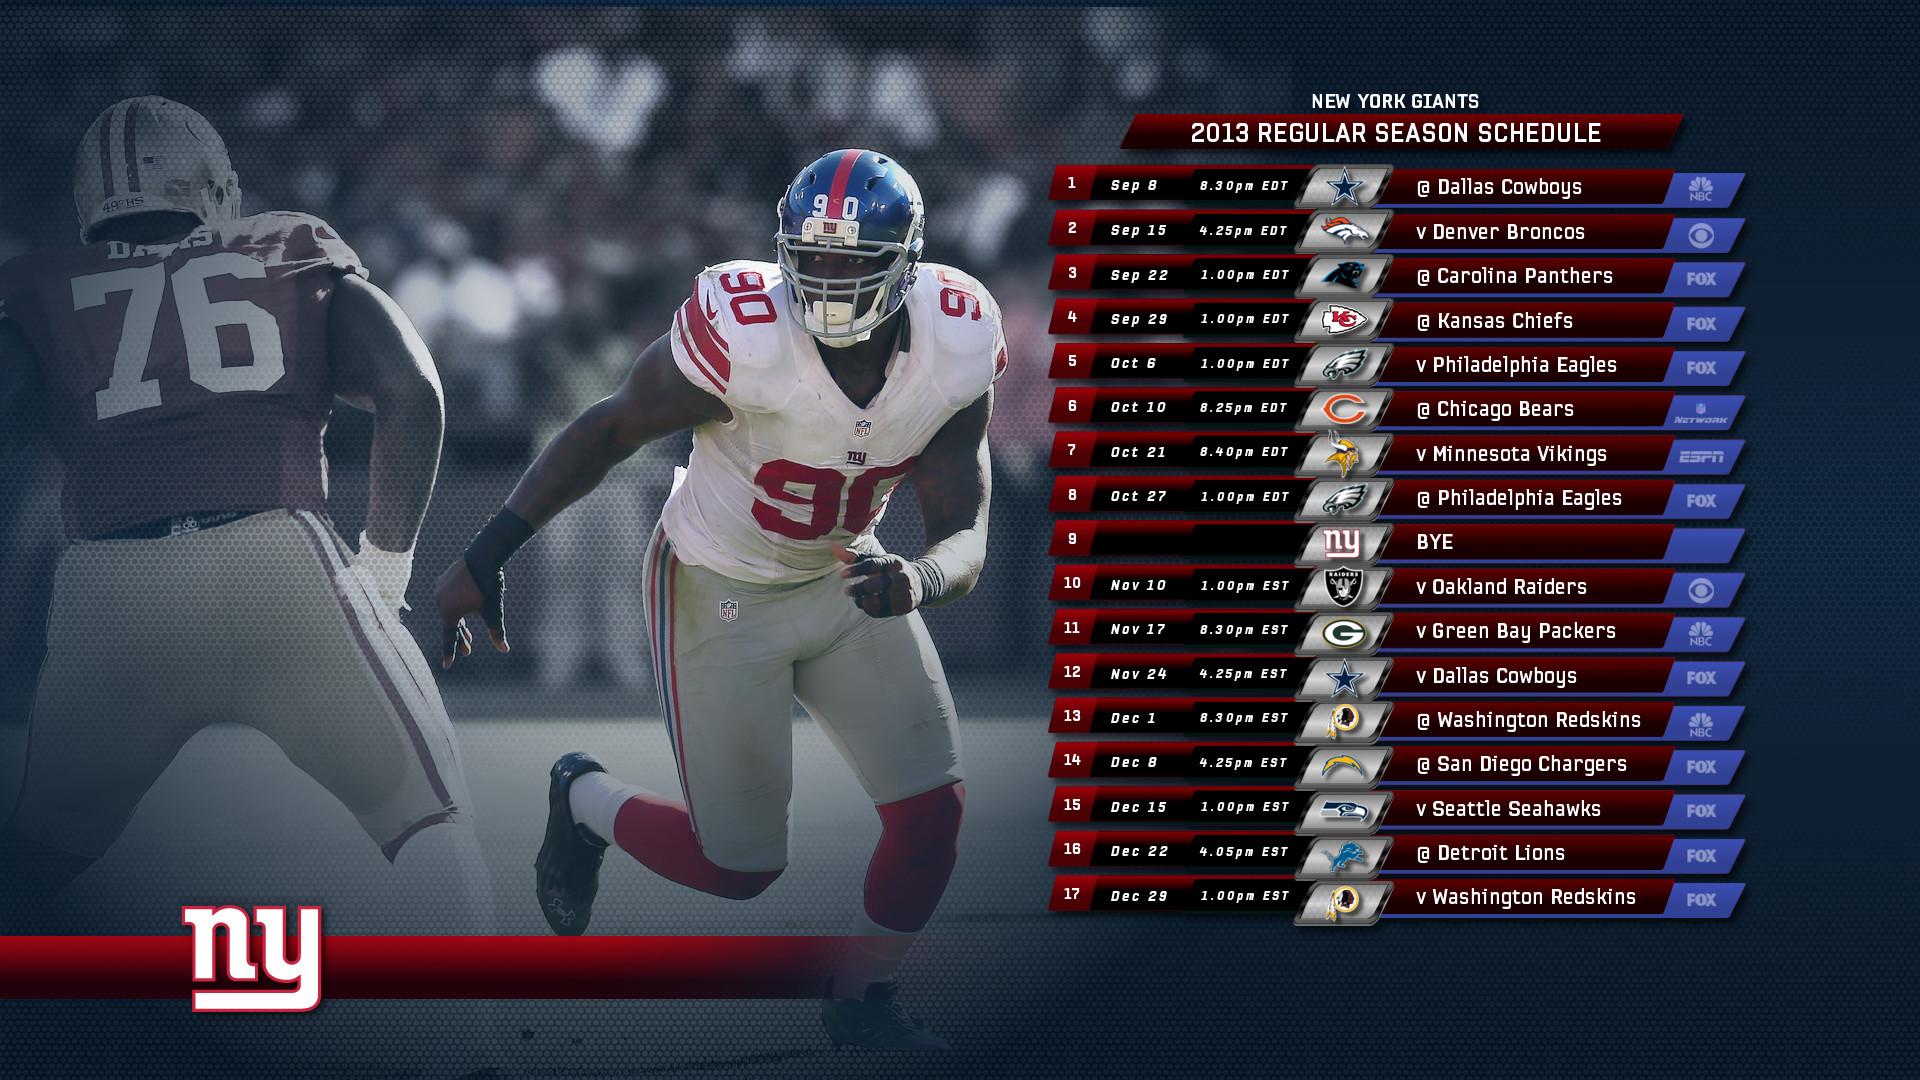 2013 Giants Schedule Wallpapers [Archive] – New York Giants Fan Forum